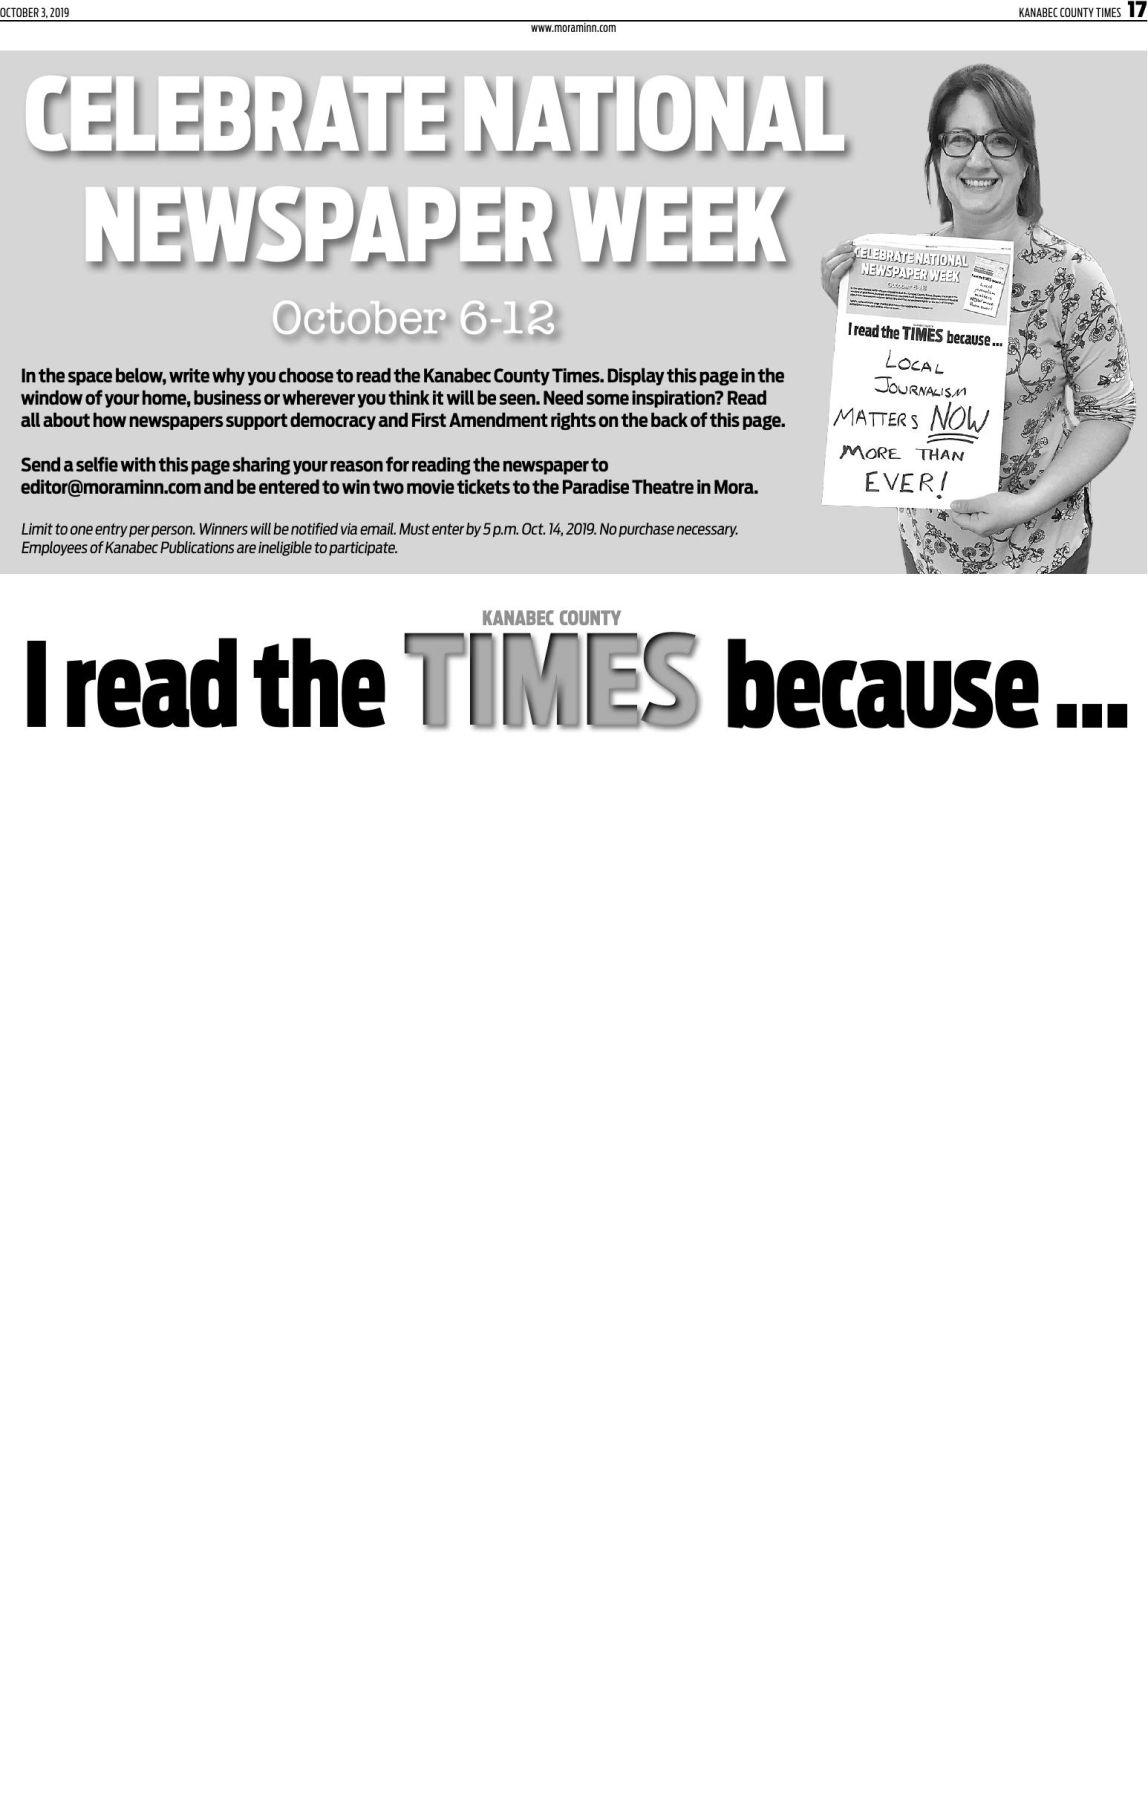 National Newspaper Week Contest